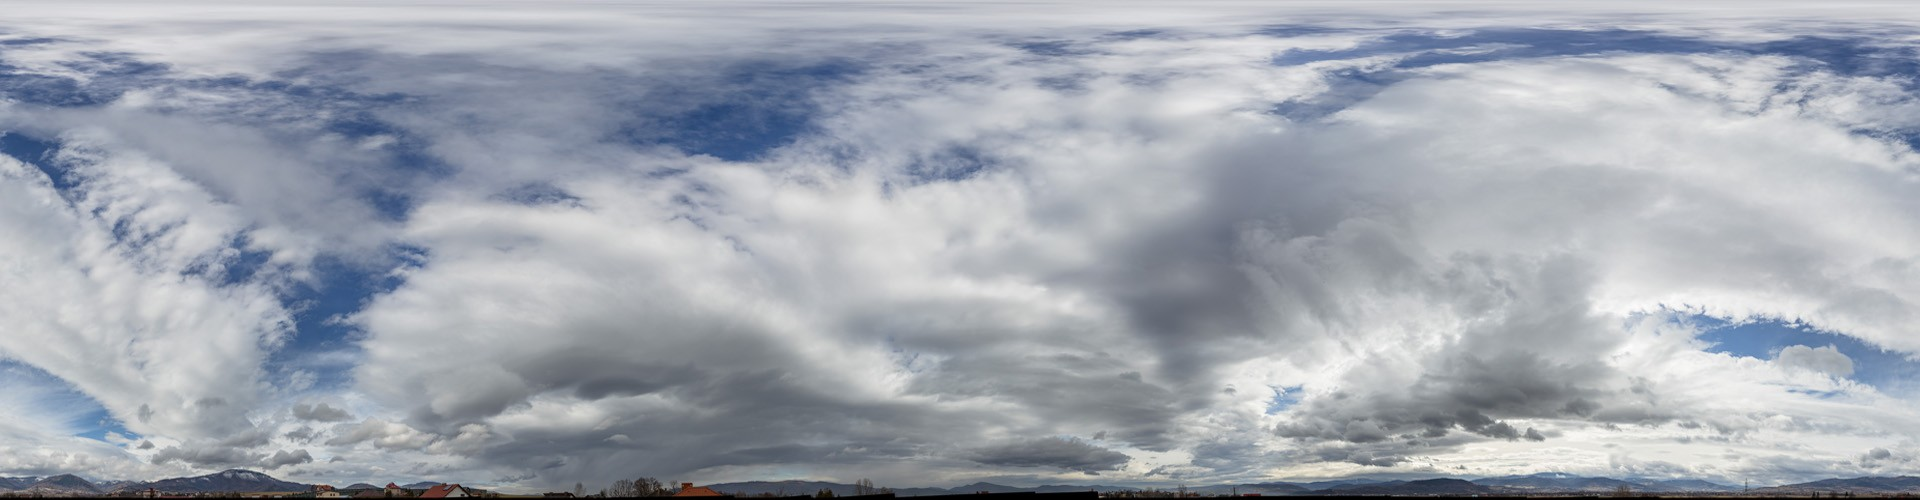 Cloudy Mountains 9032 (52k)